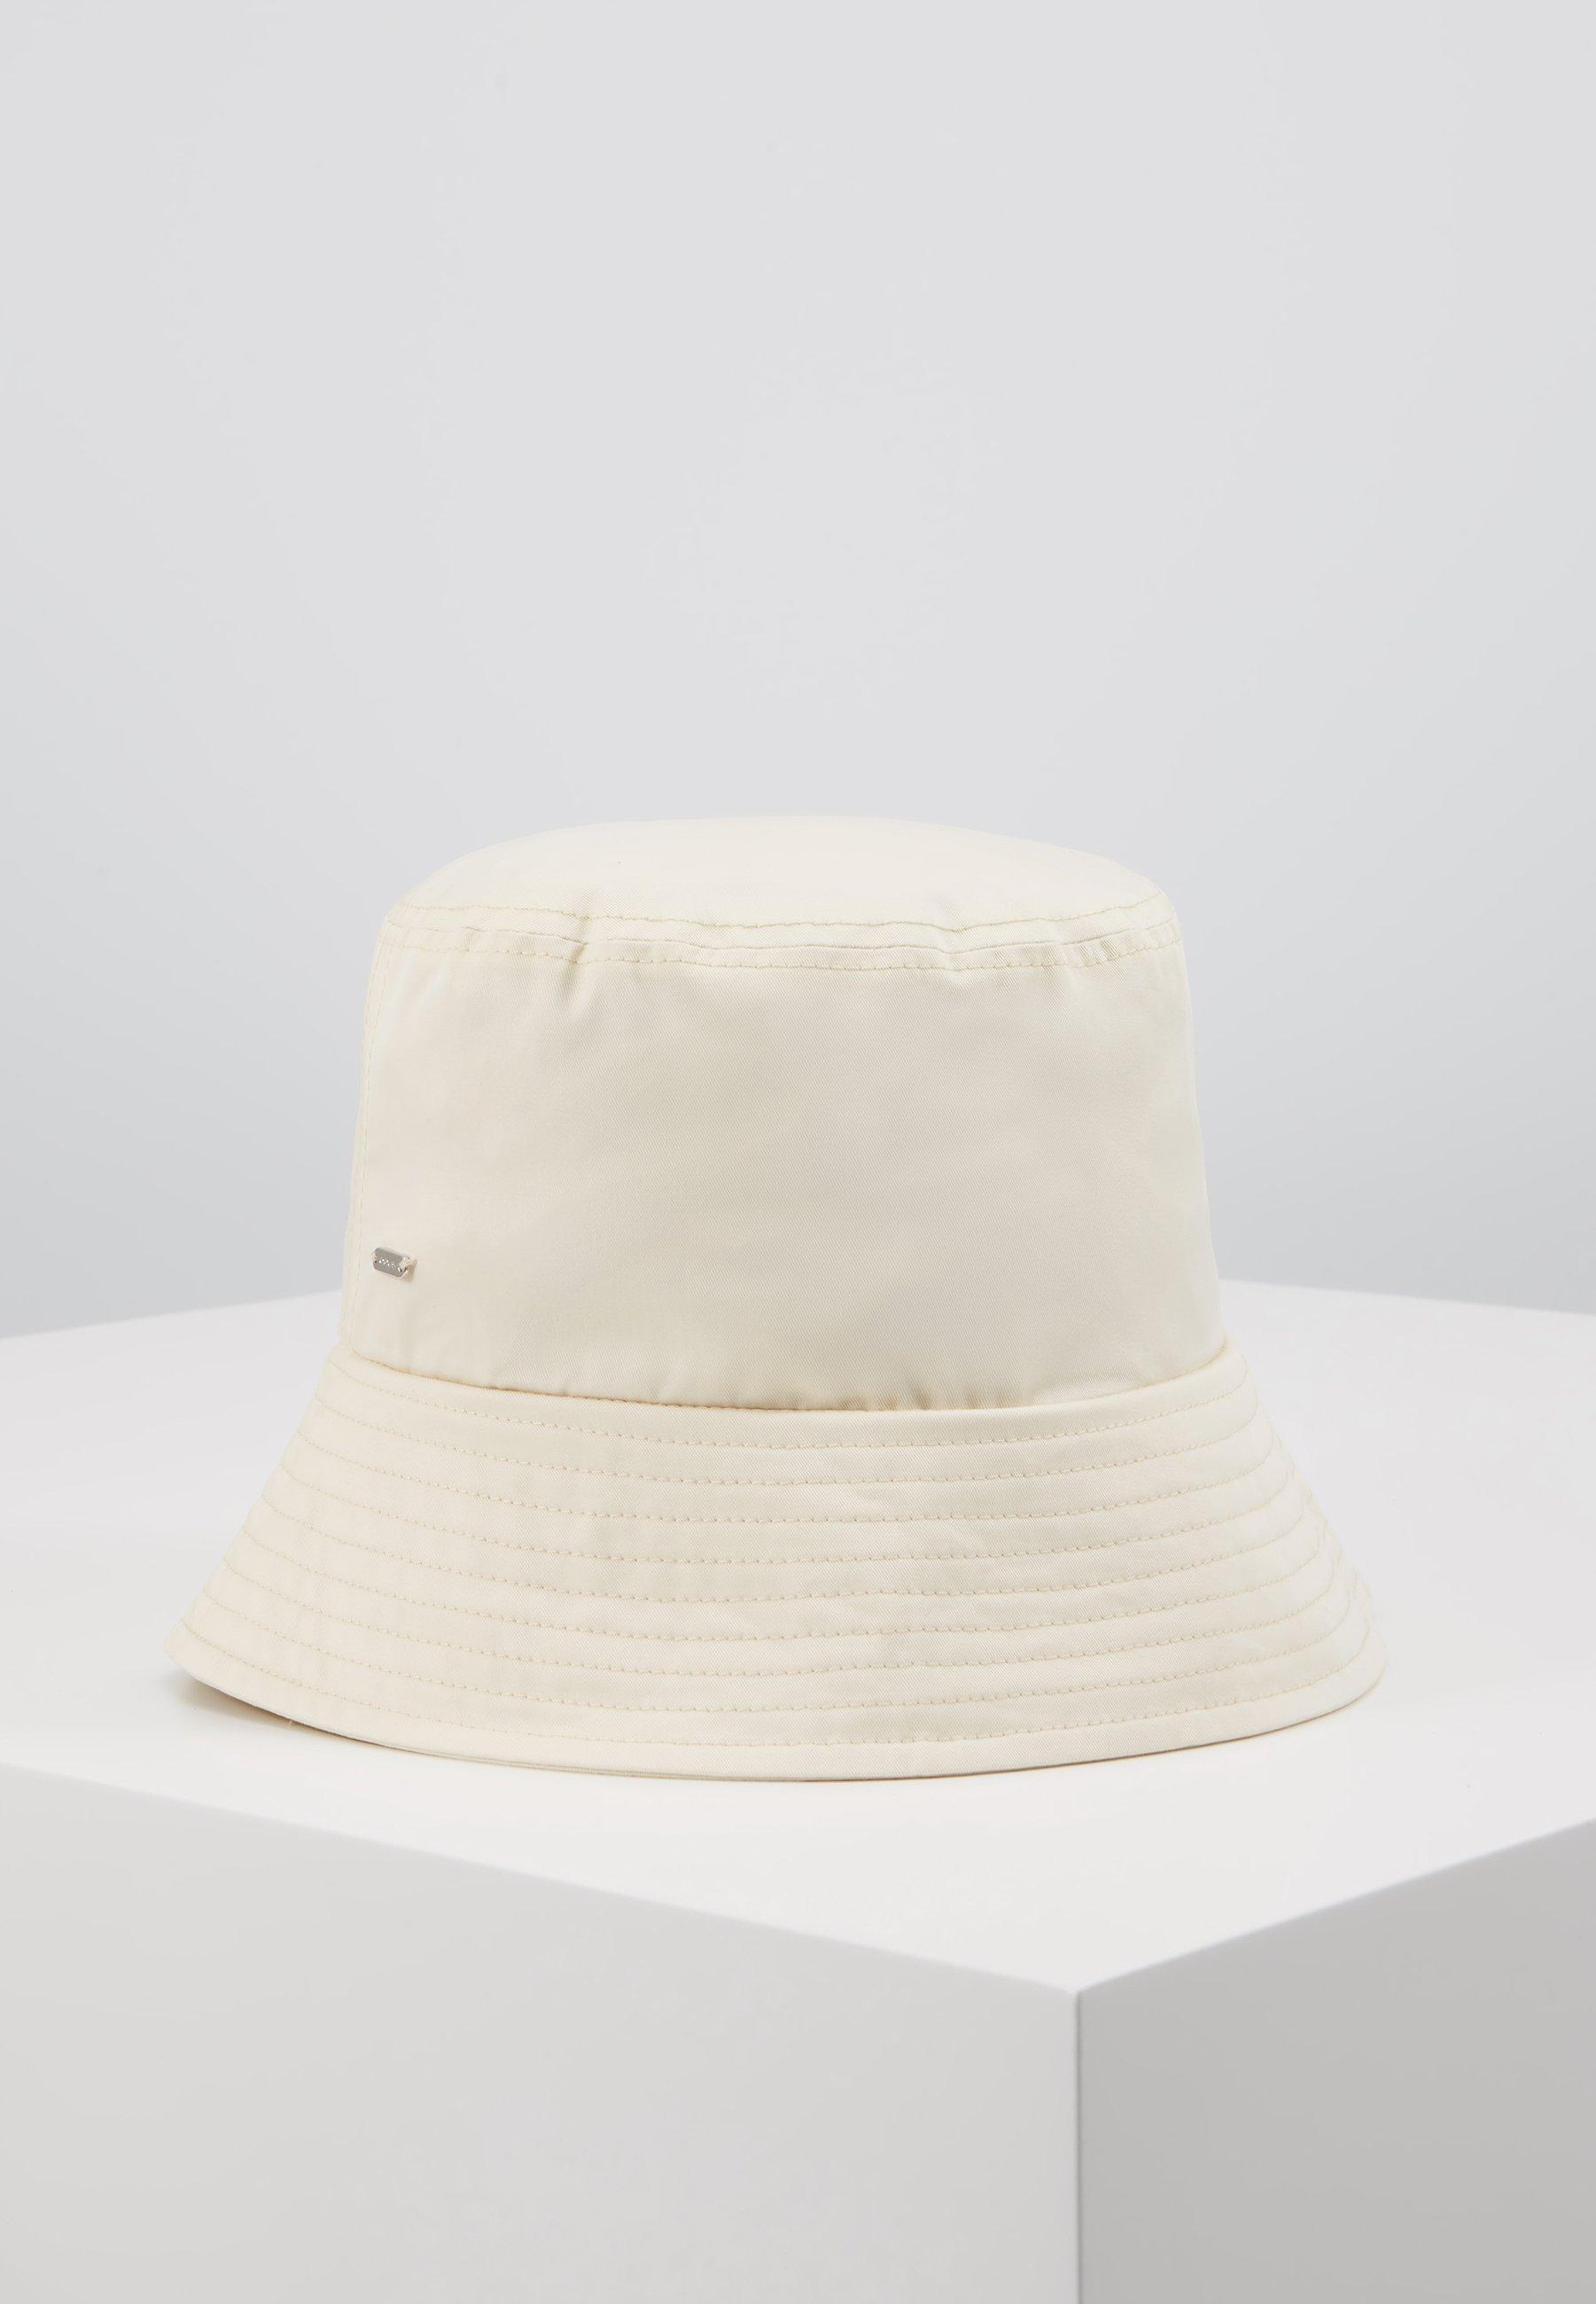 Homme ABUCKI HAT - Chapeau